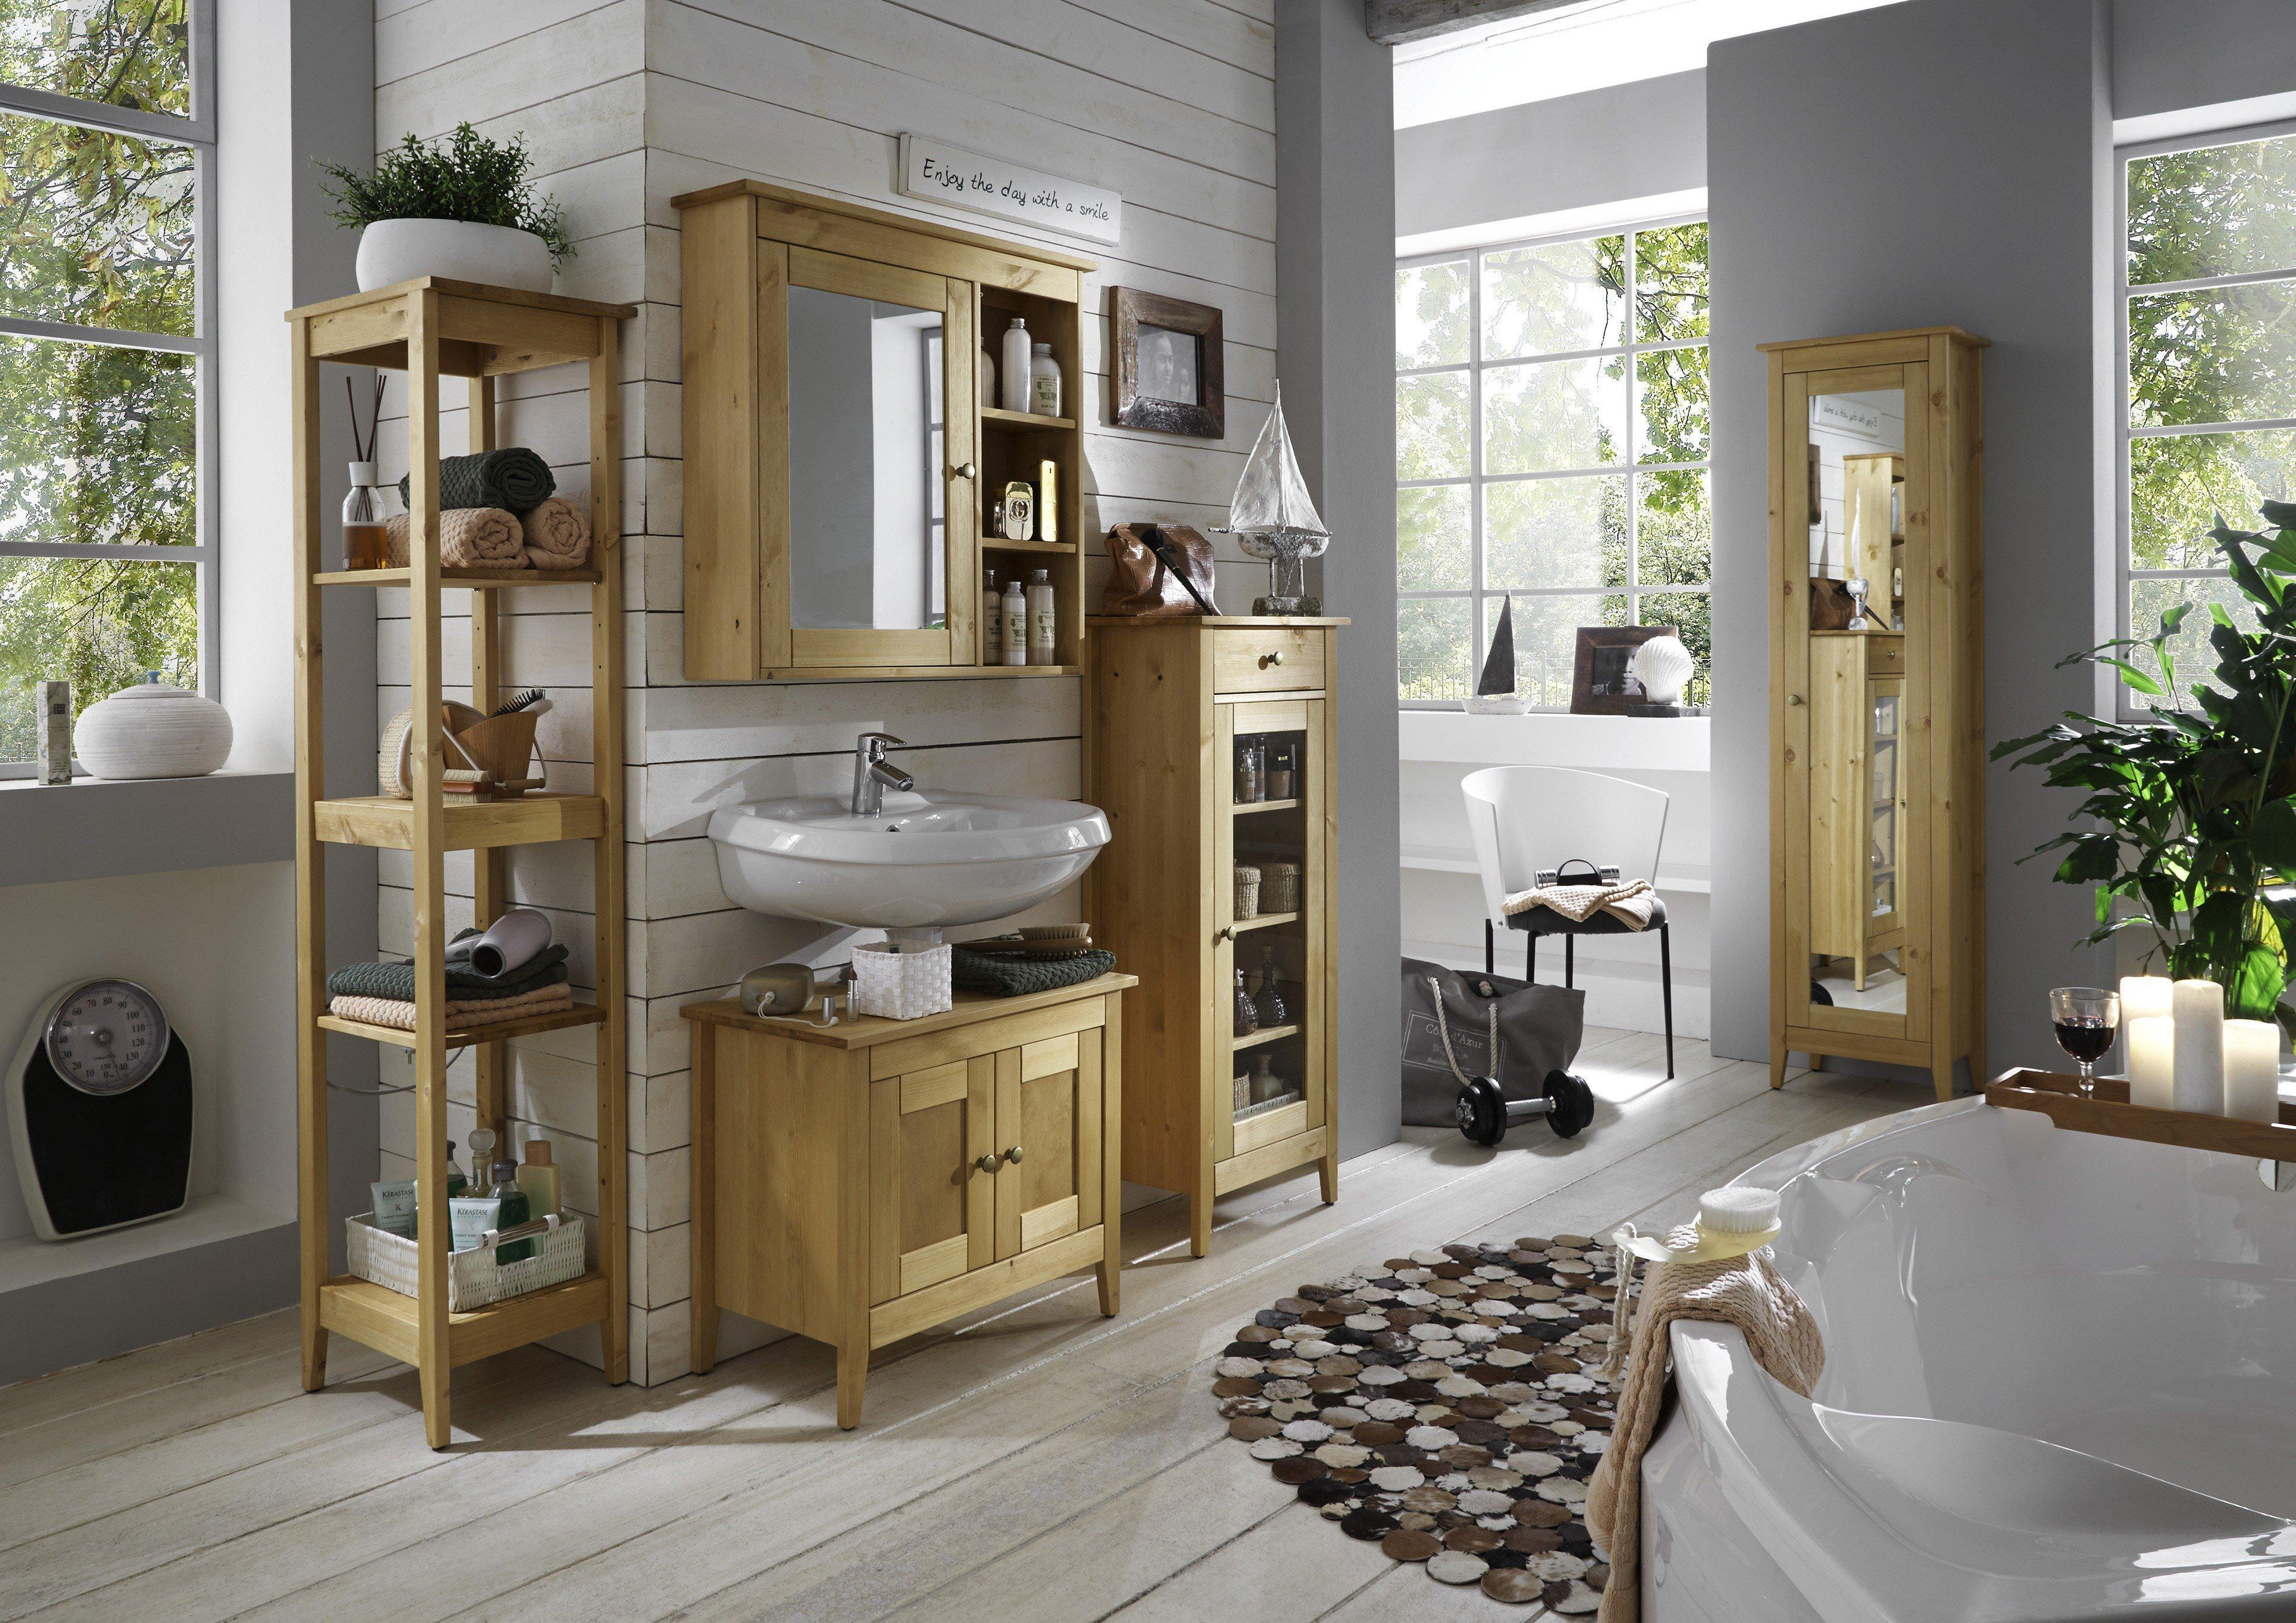 Pure Natur Badezimmer Kjell Kiefer | Möbel Letz - Ihr Online-Shop